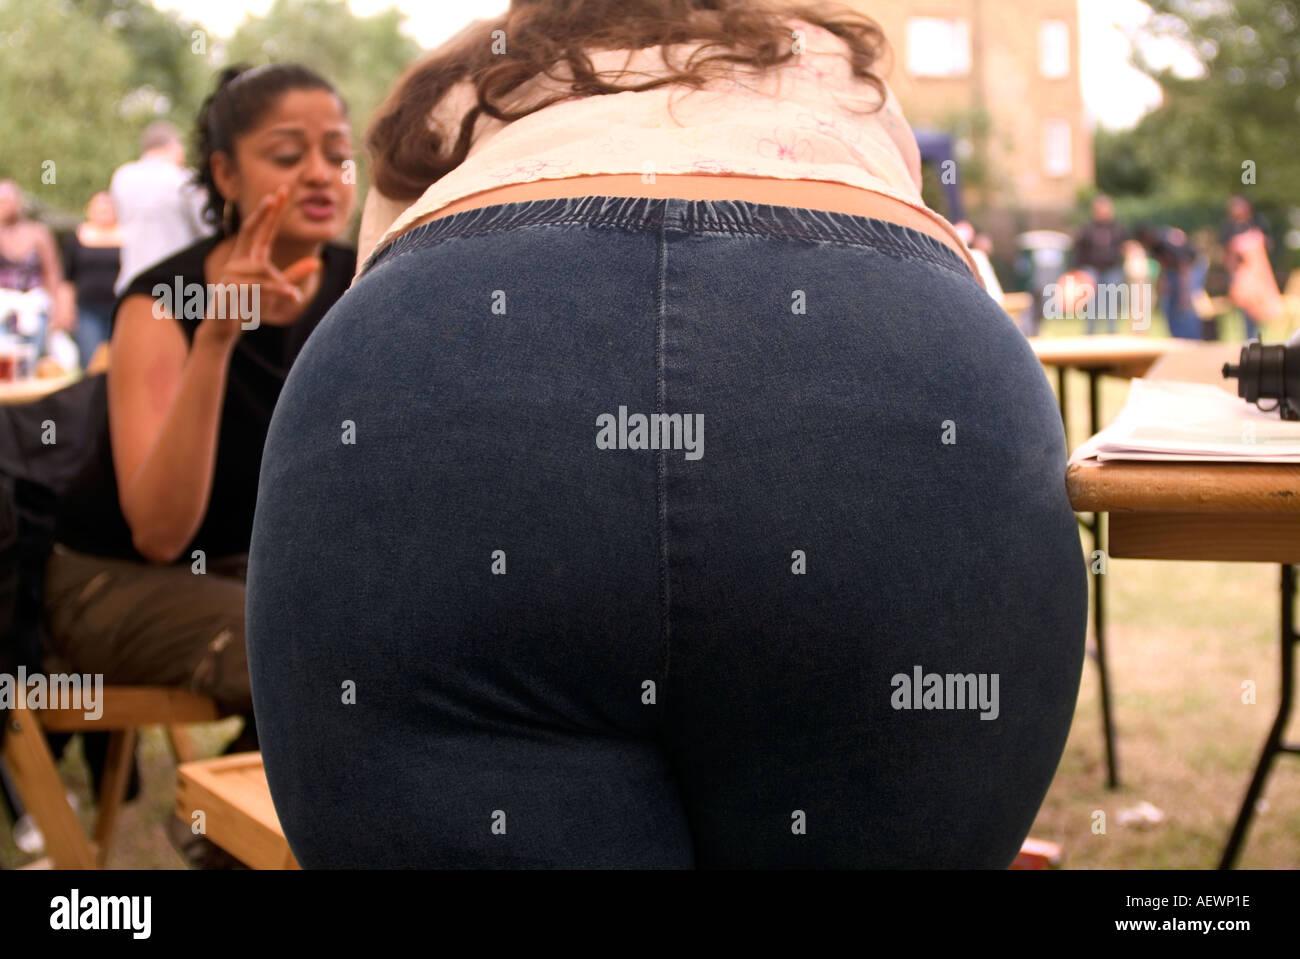 Sexy video masala